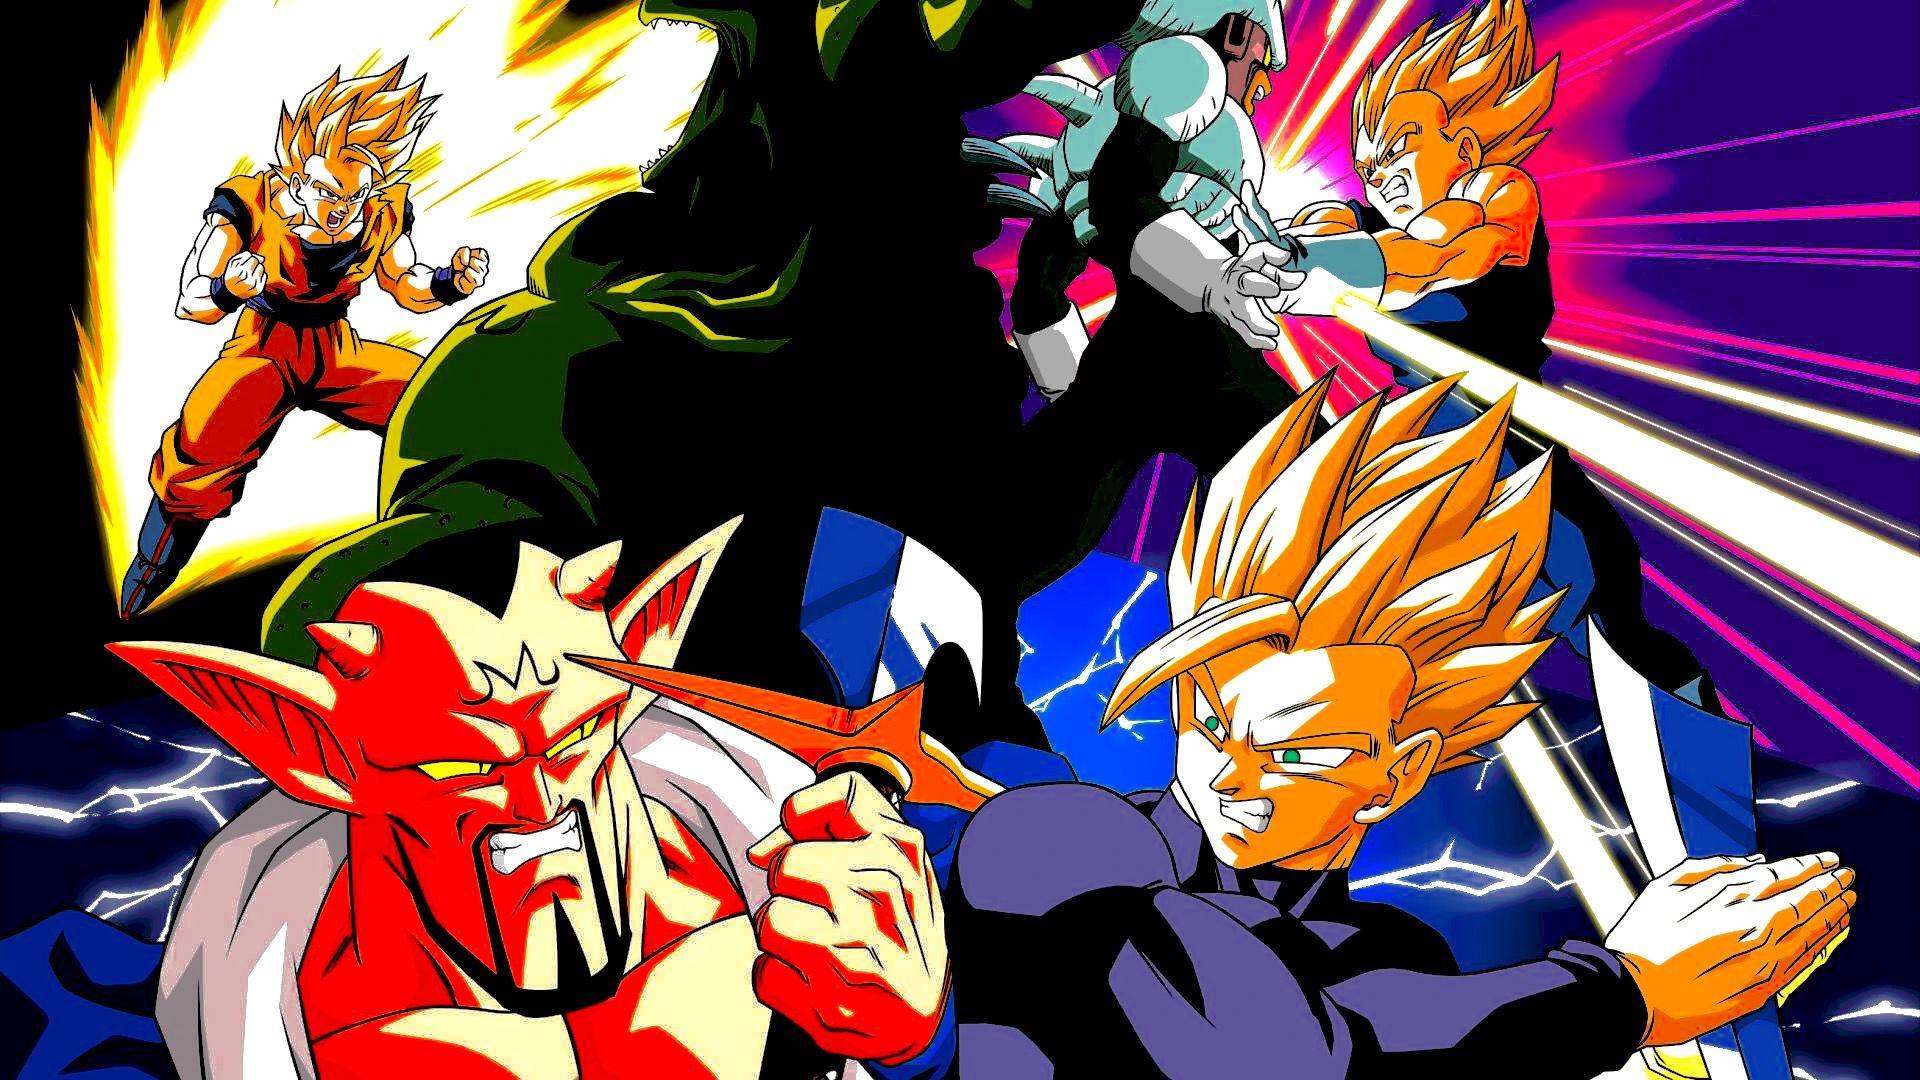 The Battle To Babidi Songokukakarot Dragon Ball Dragon Ball Z Dragon Ball Art